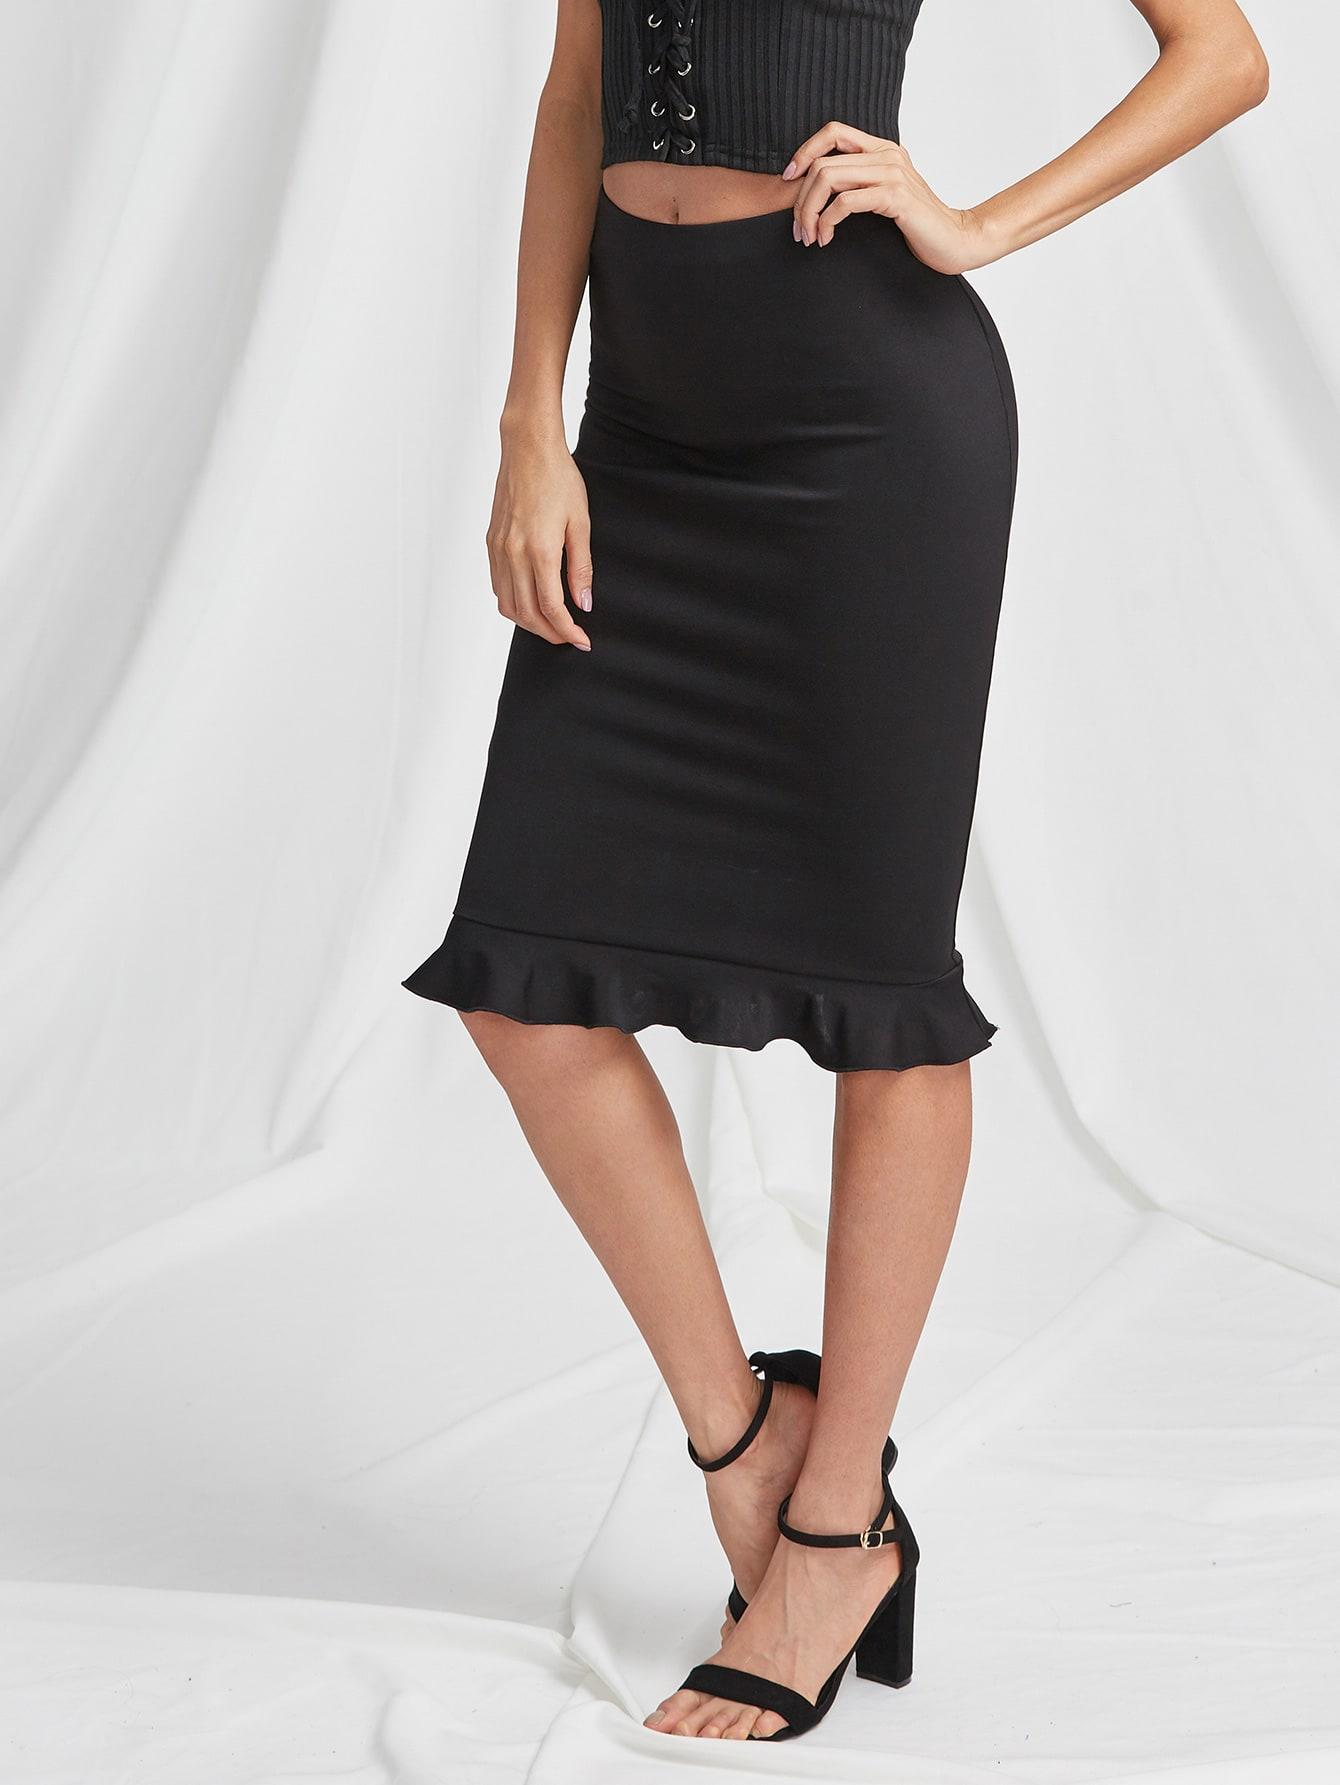 Elastic Waist Ruffle Hem Pencil Skirt elastic waist scallop ruffle hem pants